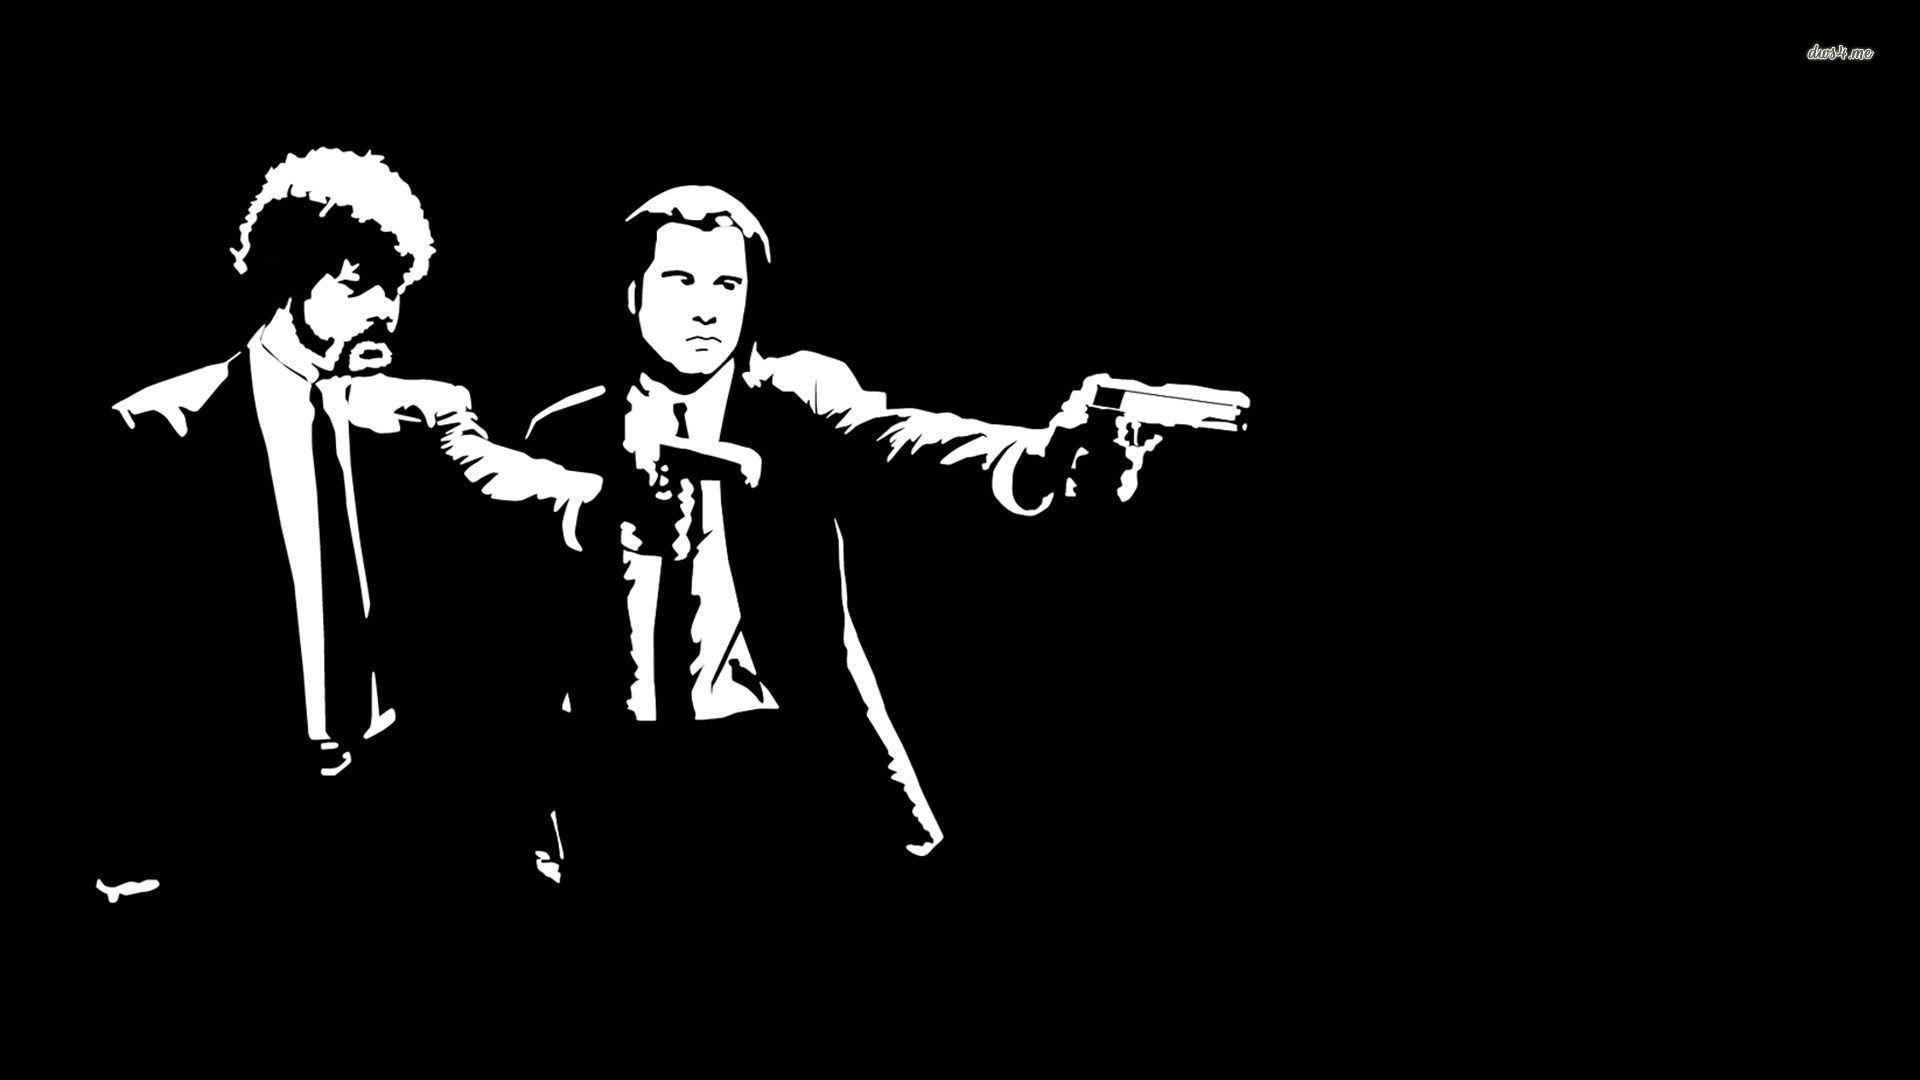 Pulp Fiction Wallpaper HD - WallpaperSafari